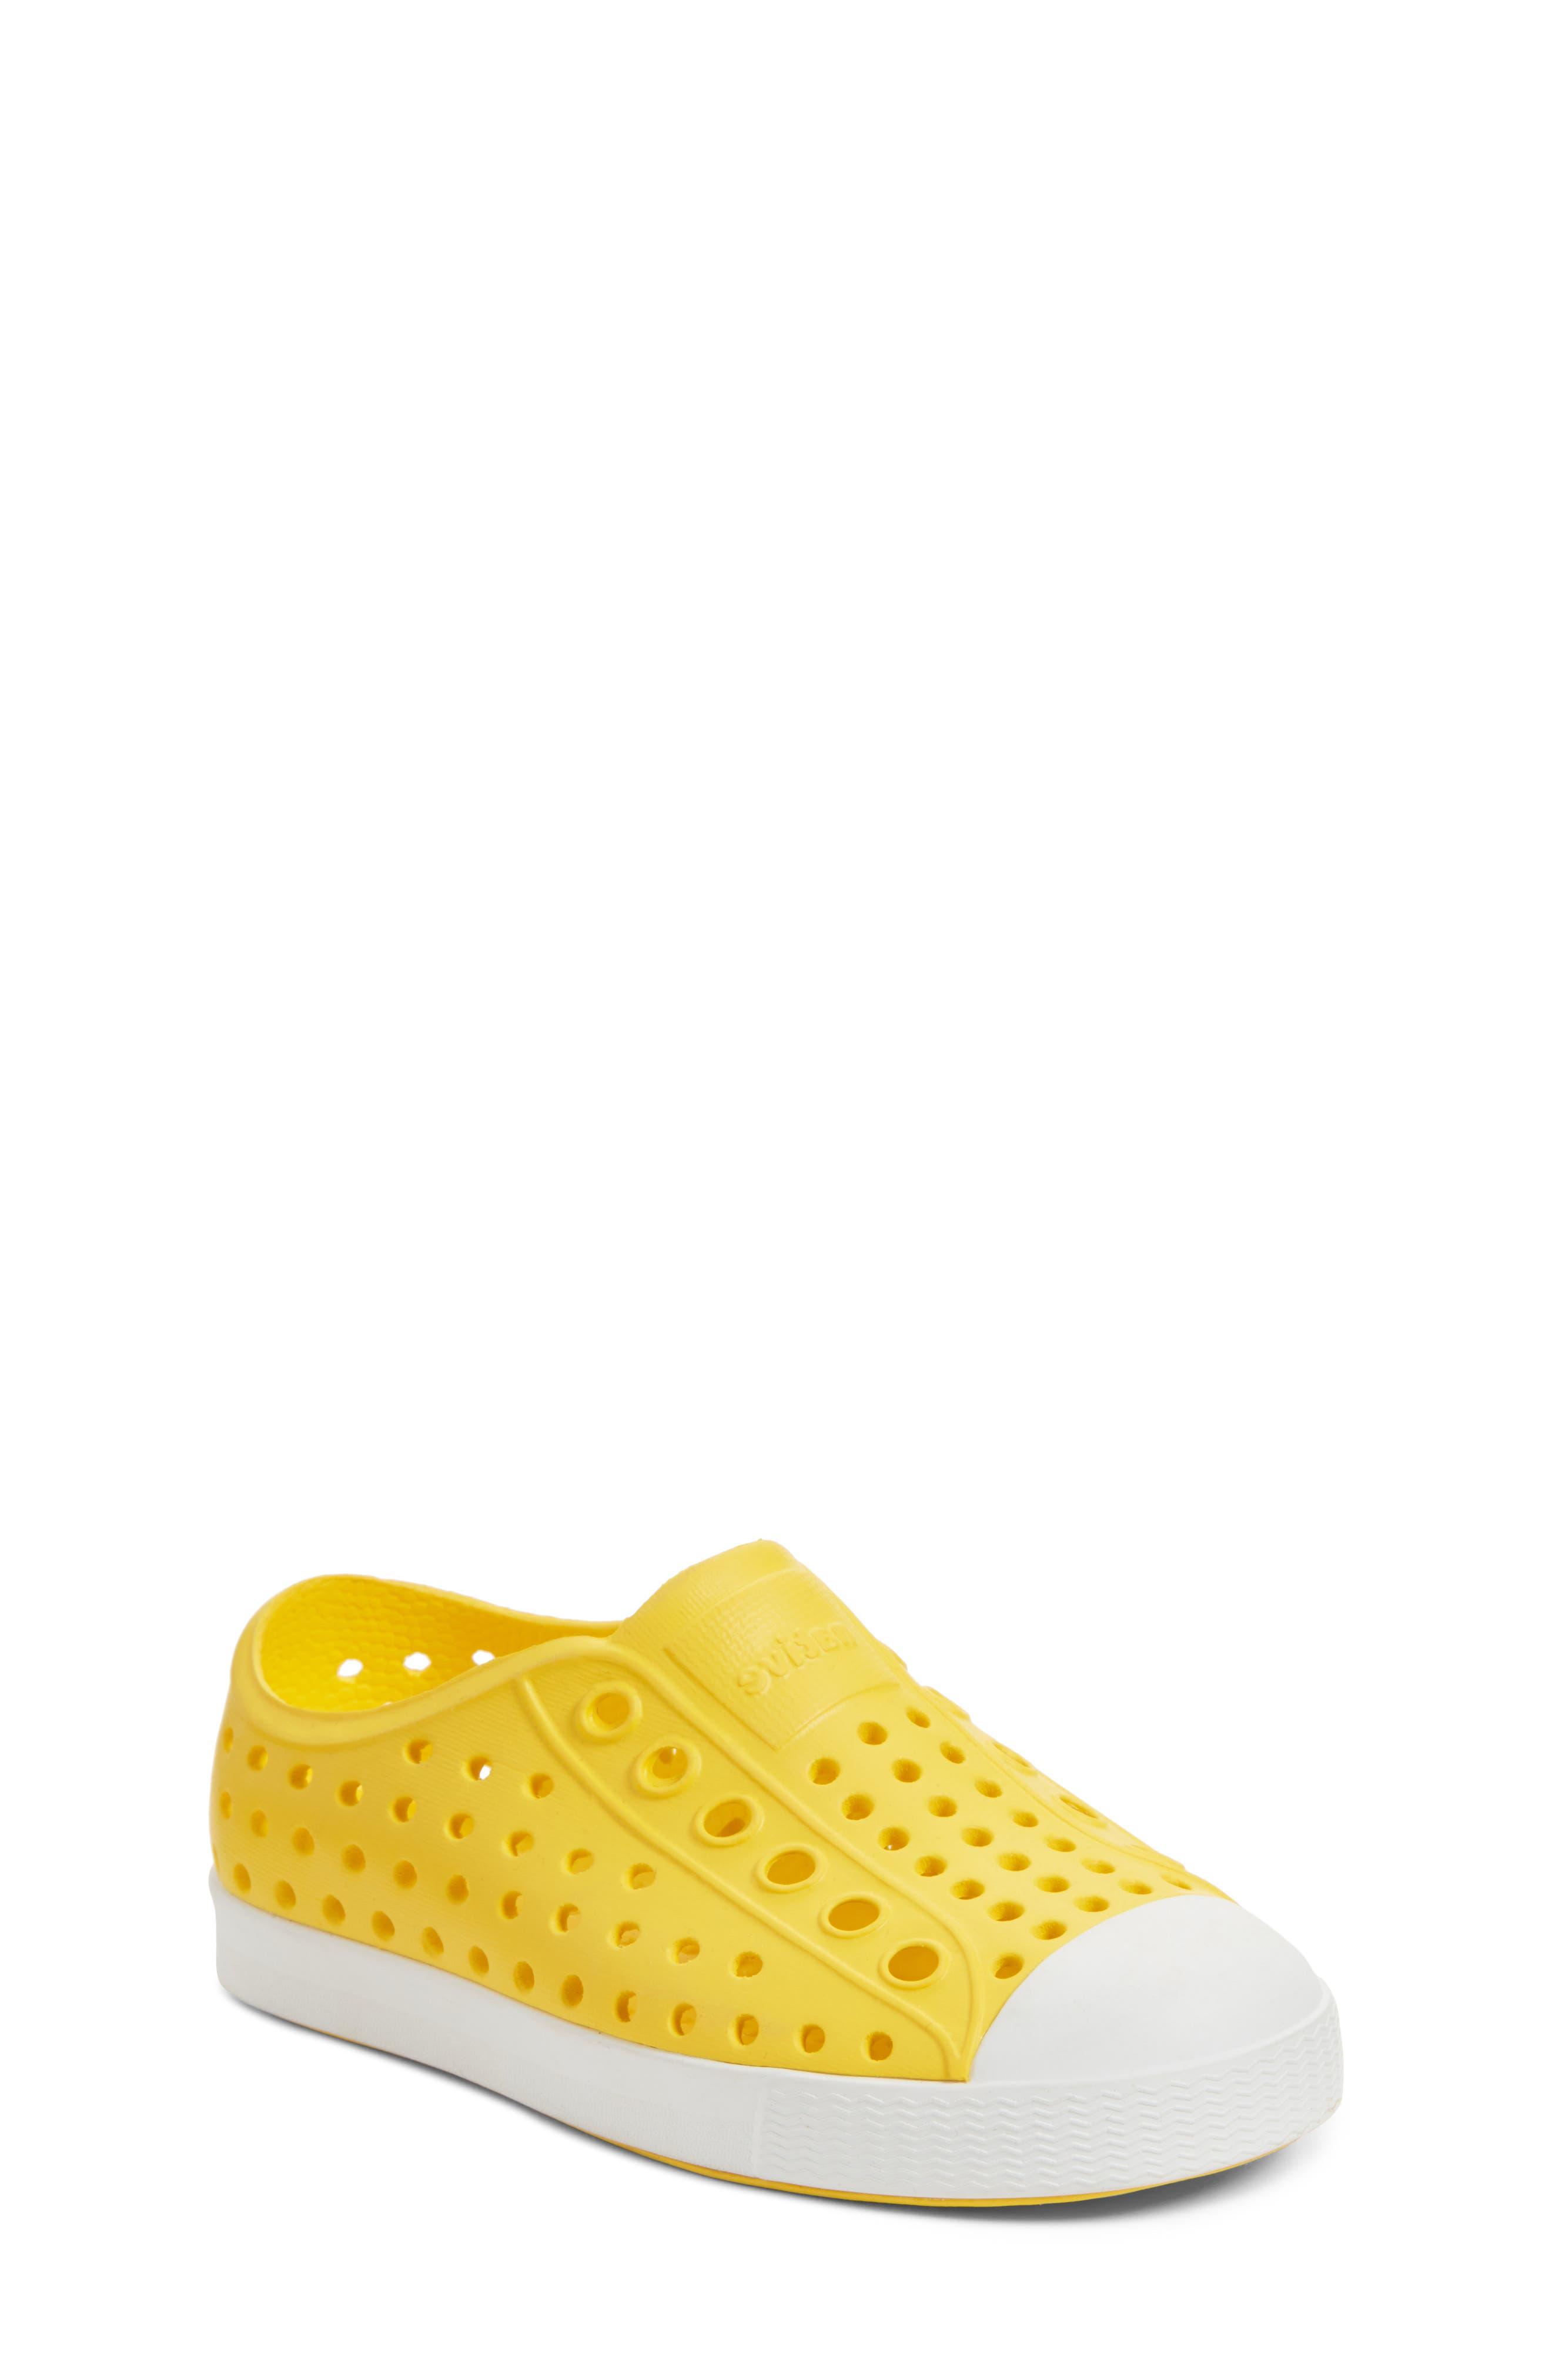 'Jefferson' Water Friendly Slip-On Sneaker,                             Main thumbnail 25, color,